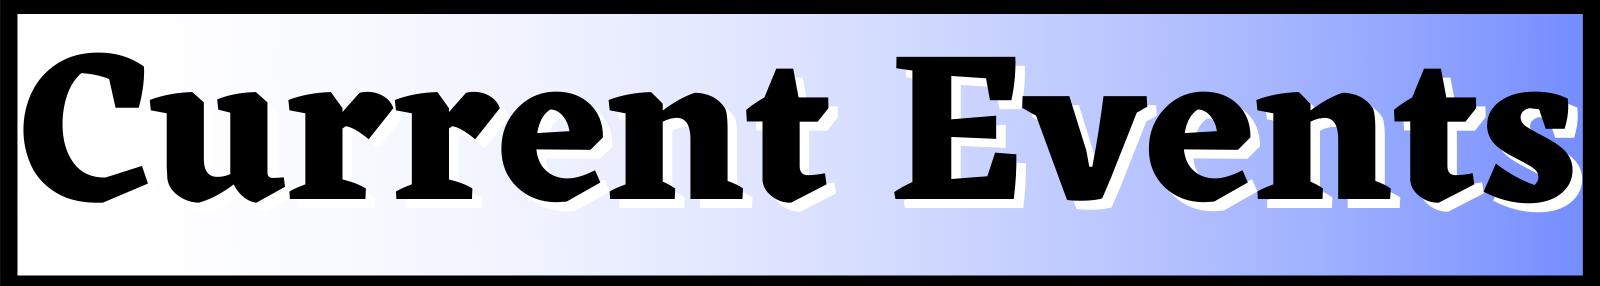 Newsbank Current Events link